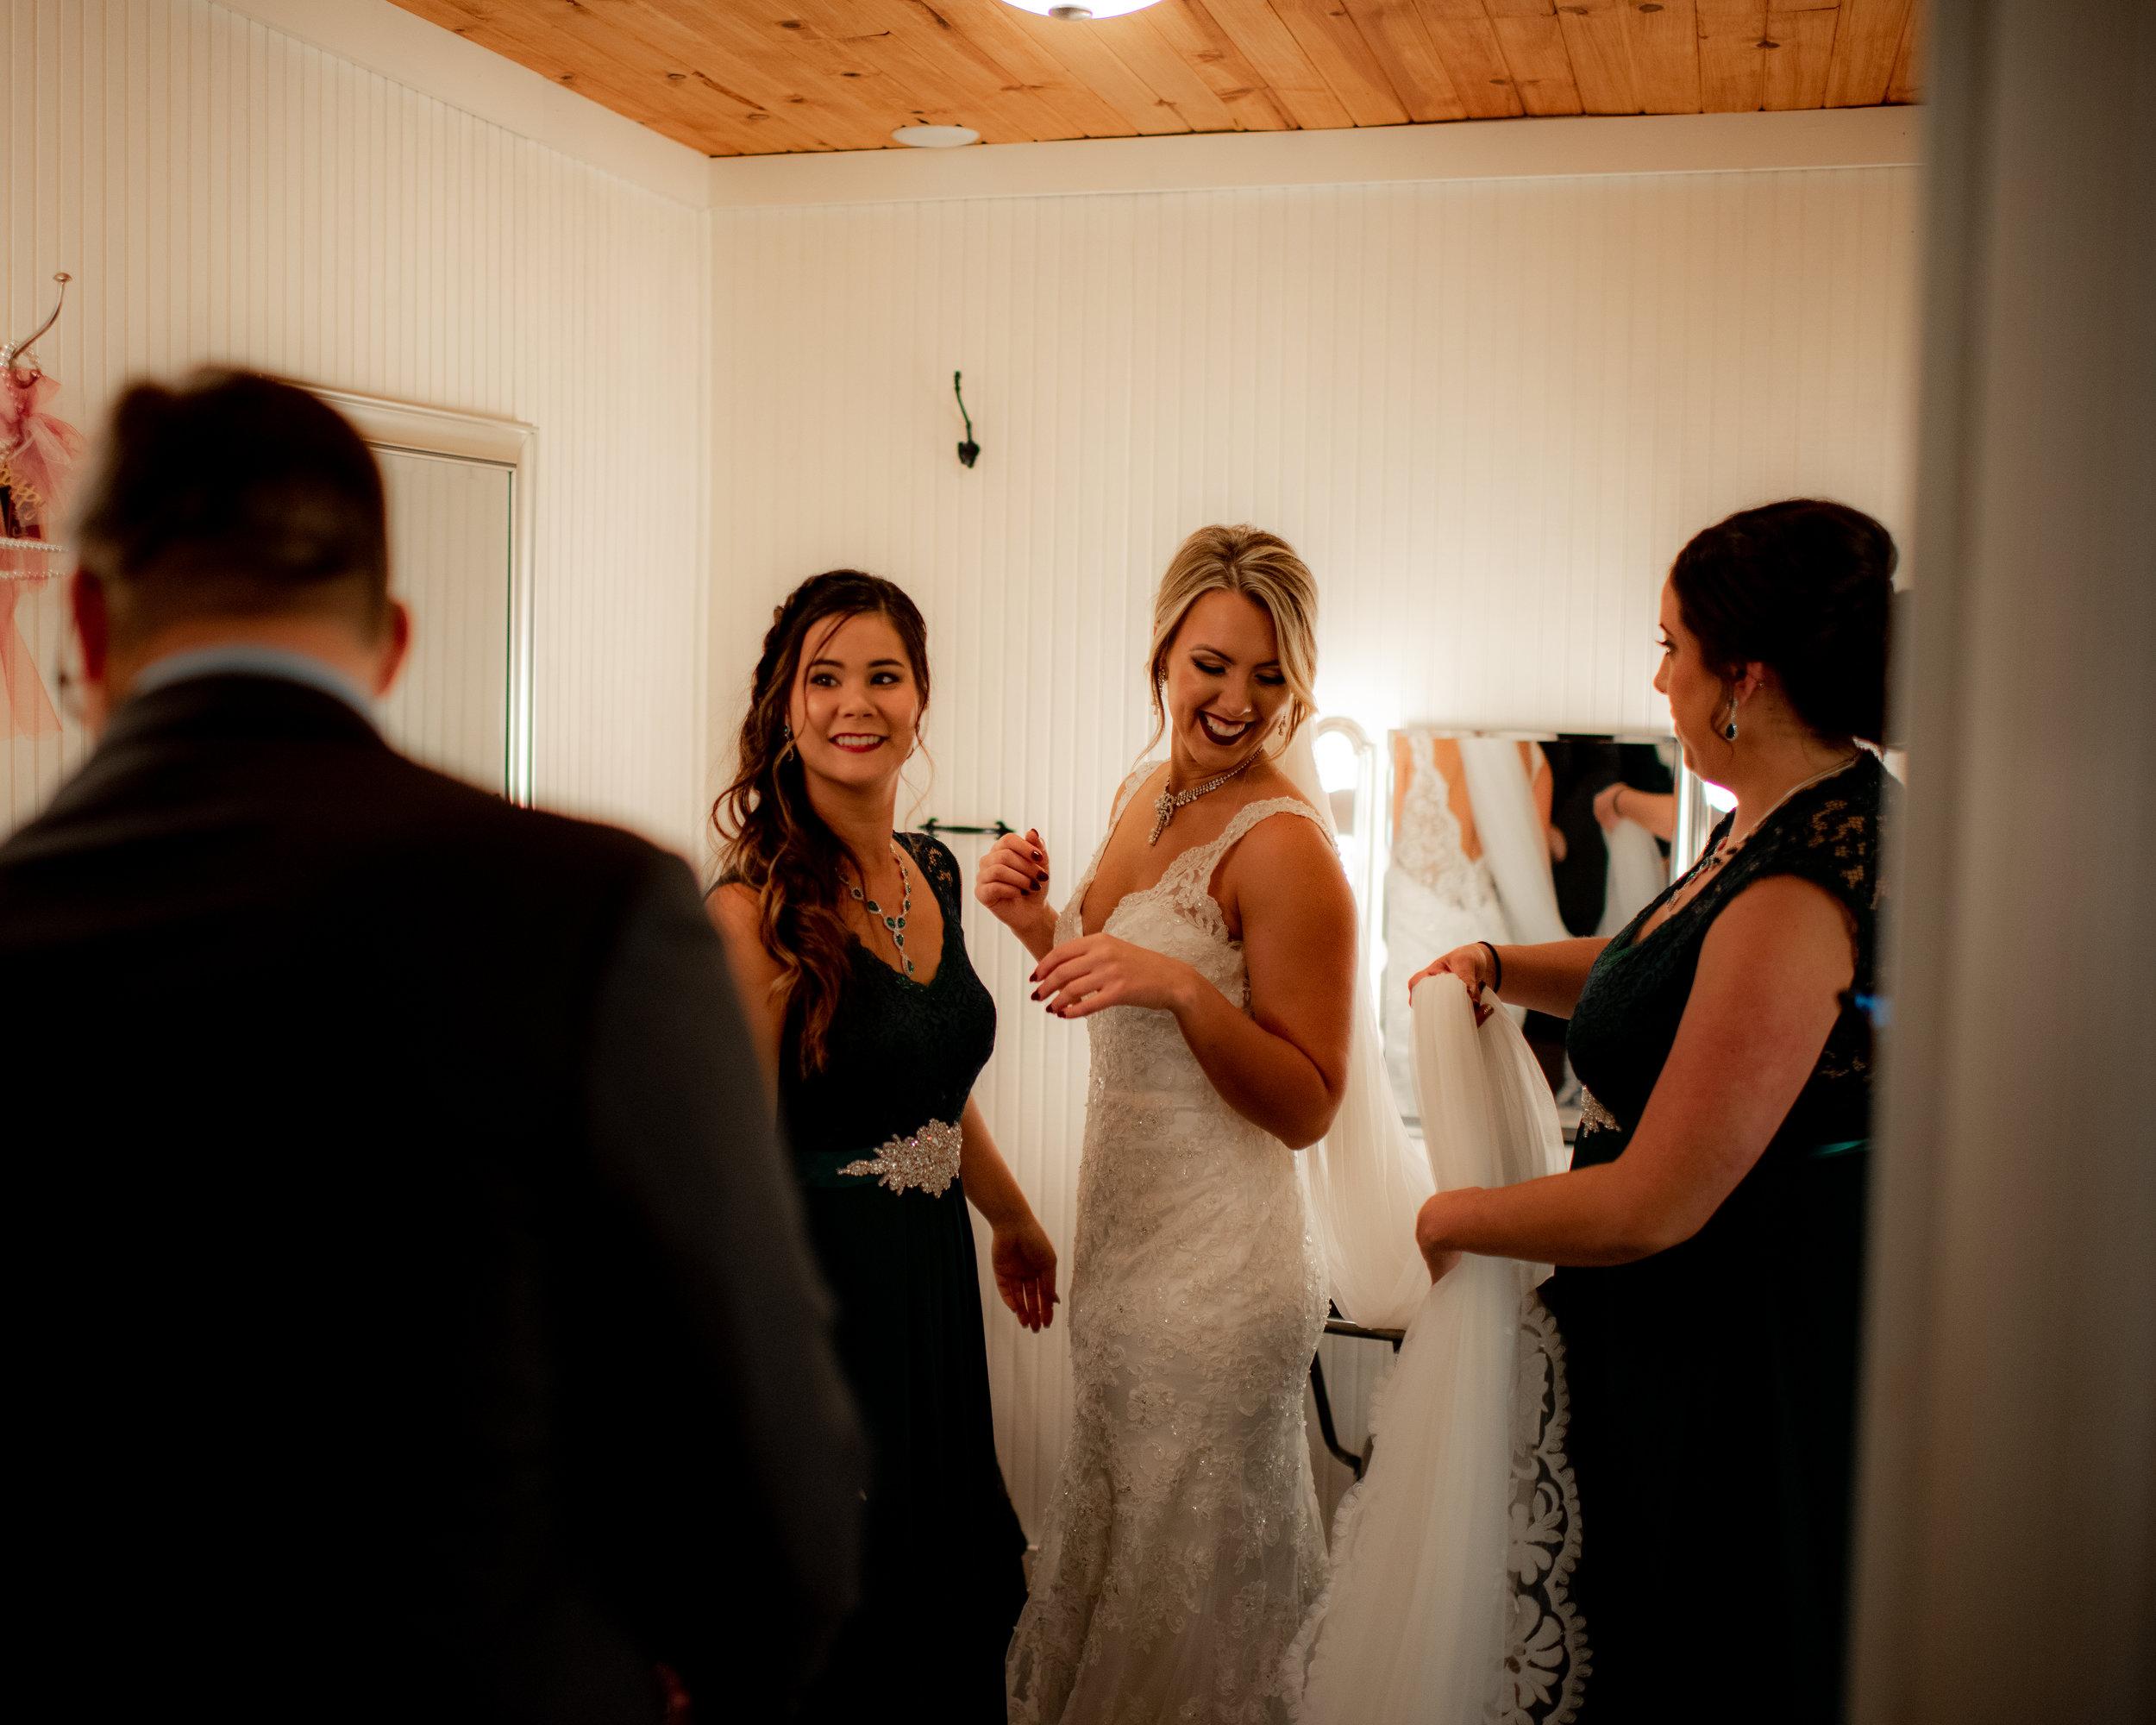 Anthony & Tamara's Wedding.1-176.jpg